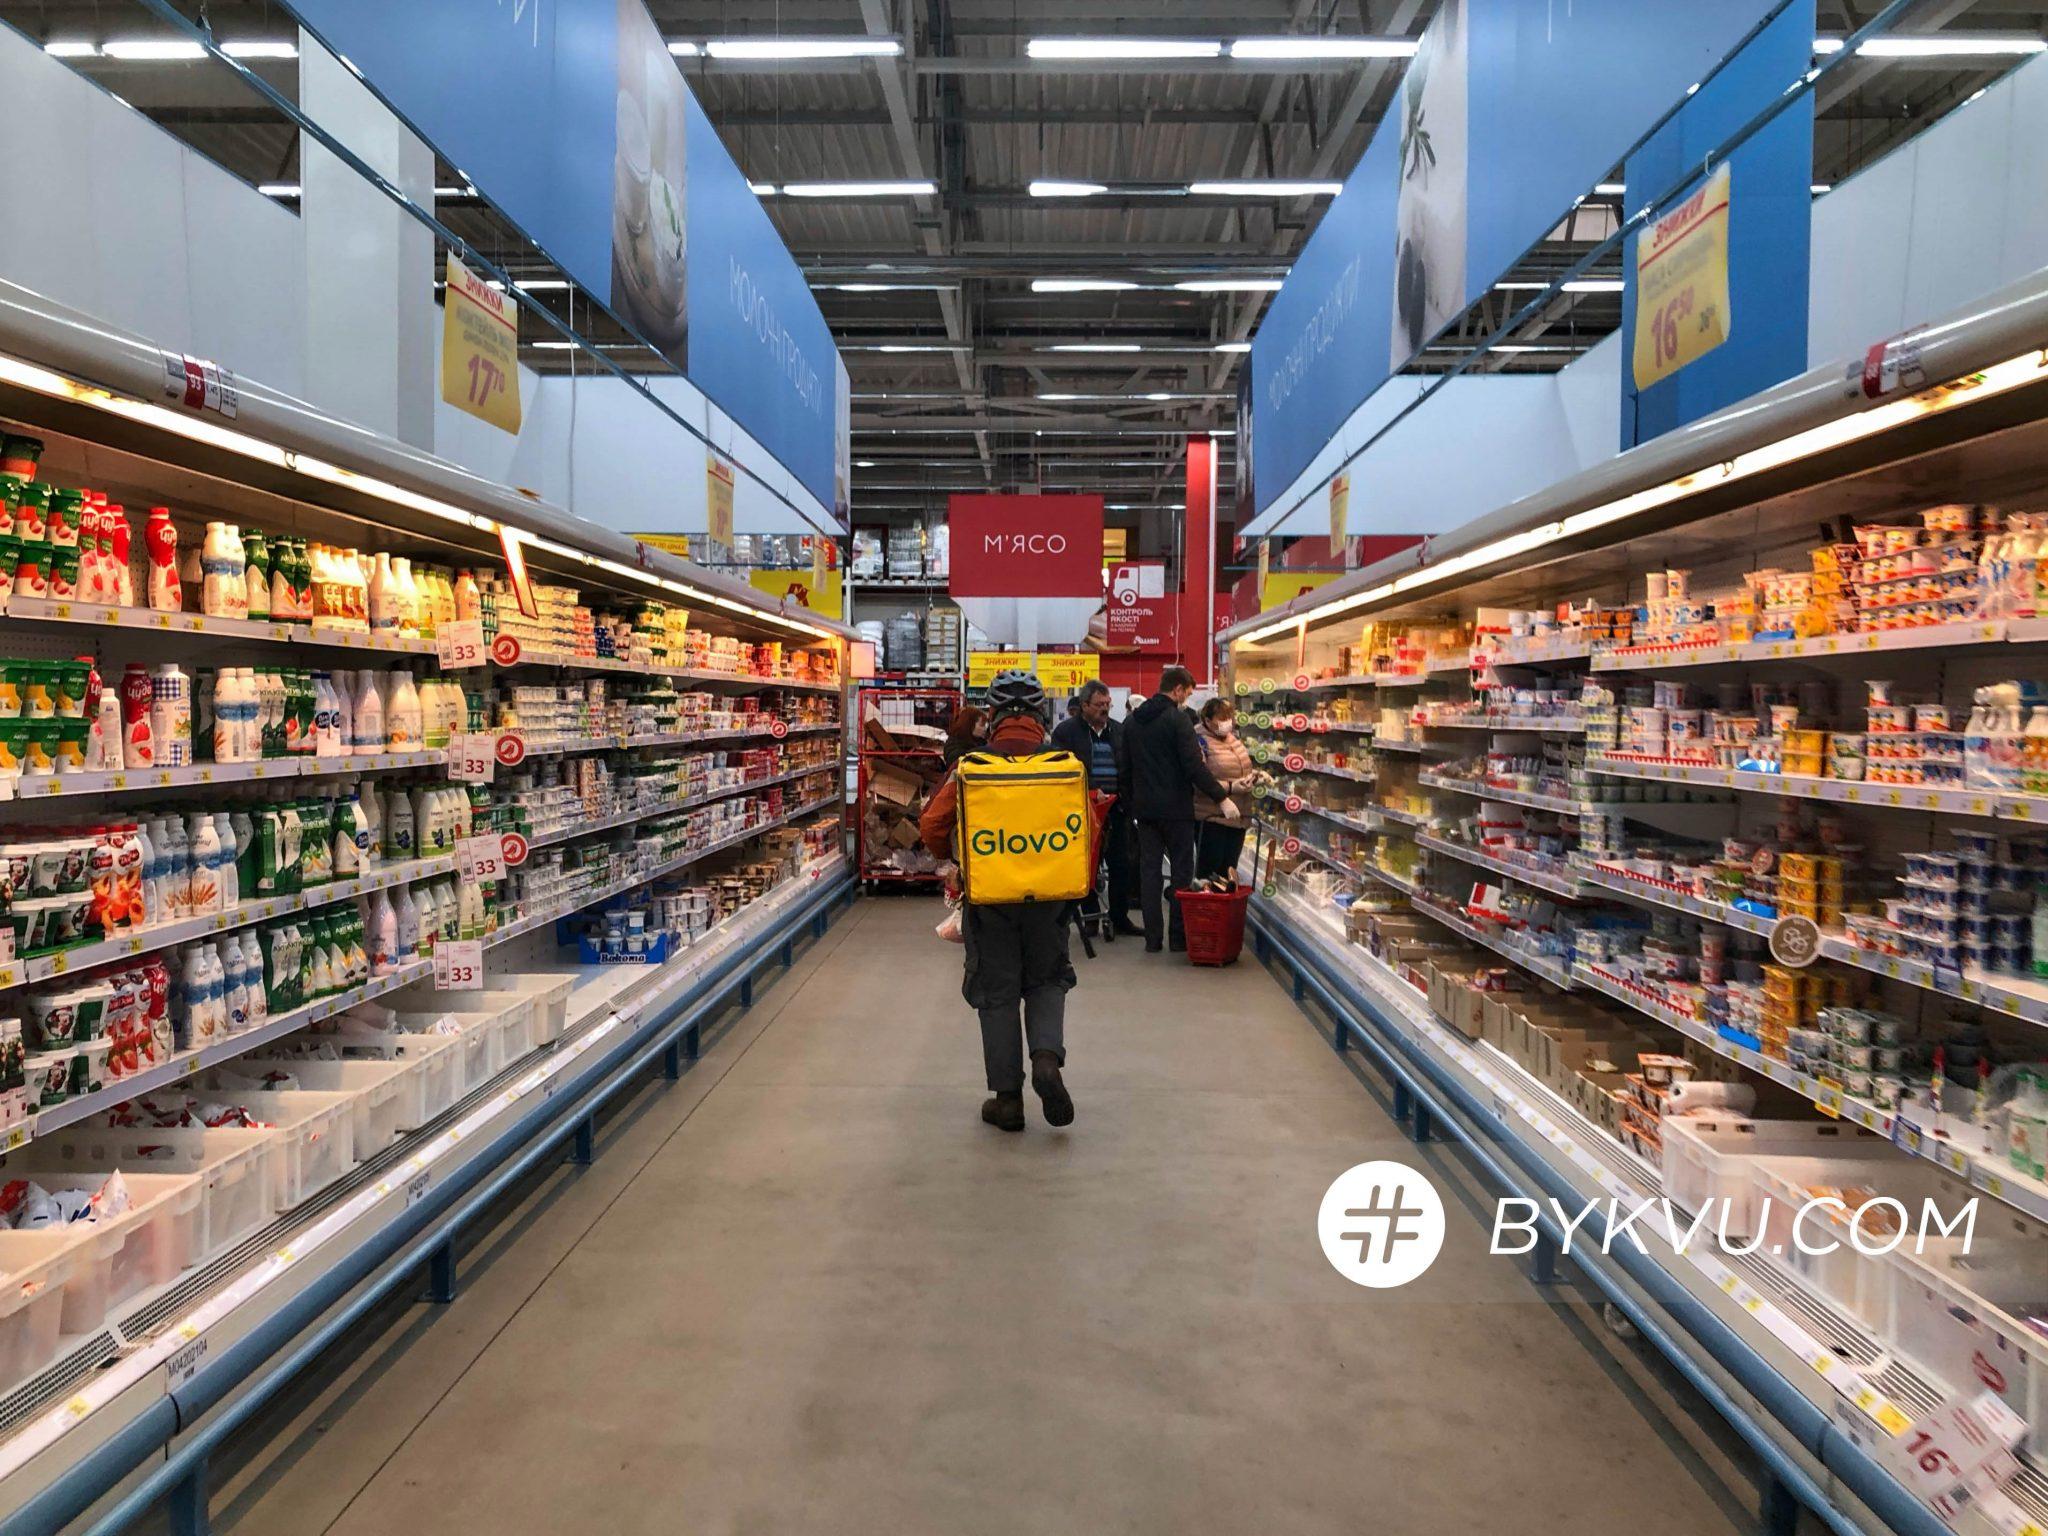 карантин_киев_супермаркет_полки